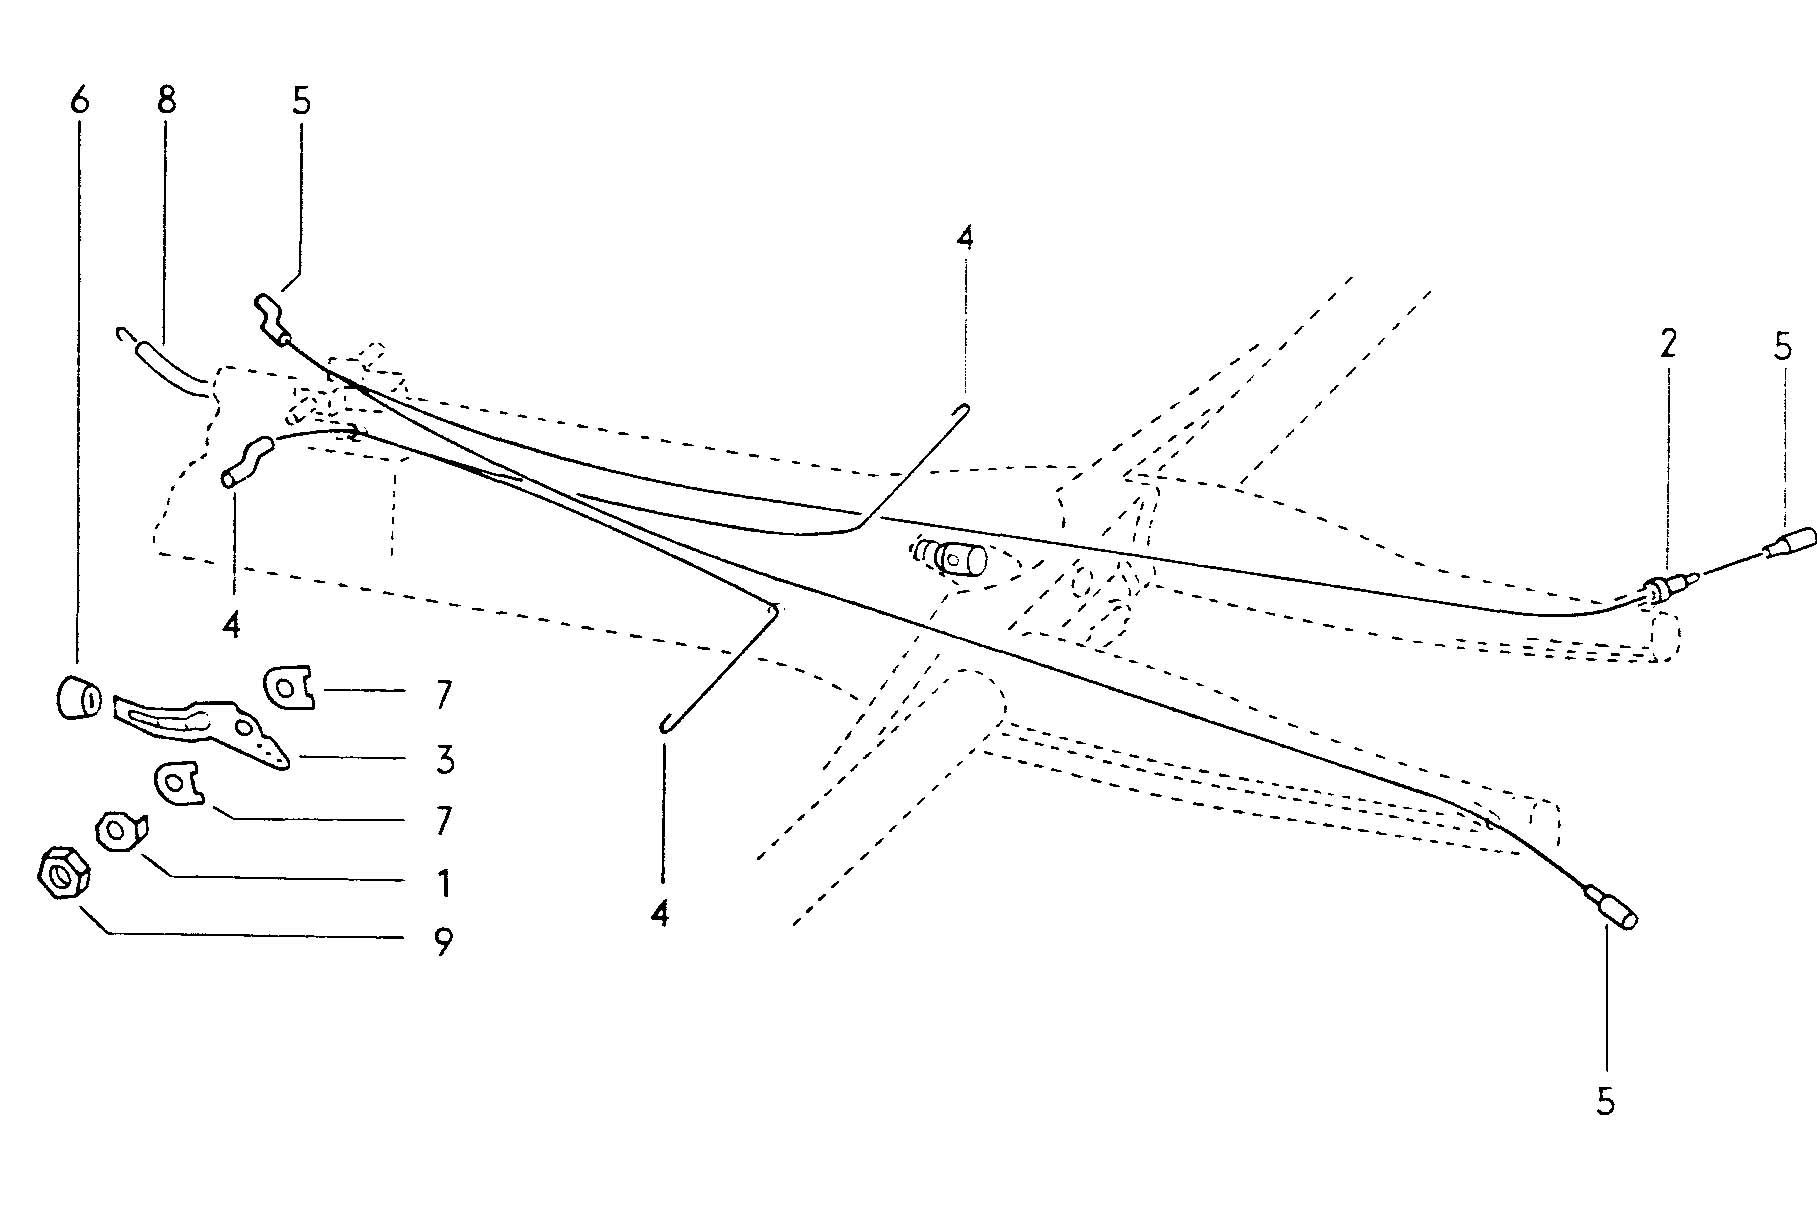 1992 vw corrado vr6 wiring diagram